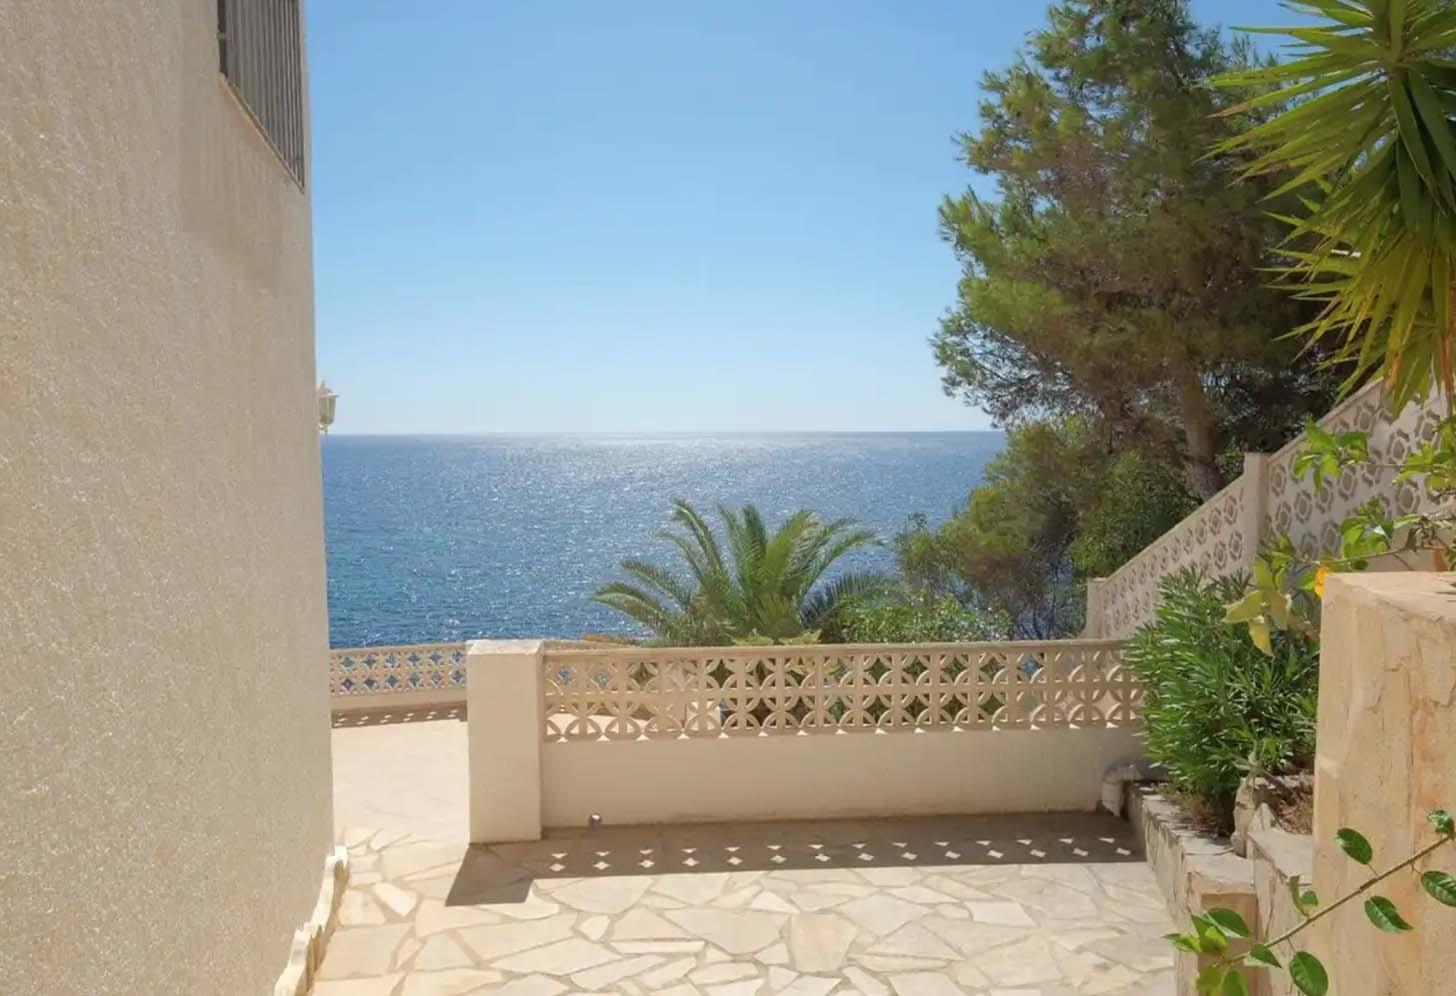 immobilier acheter une maison à calpe 011 d1 terrasse vue mer